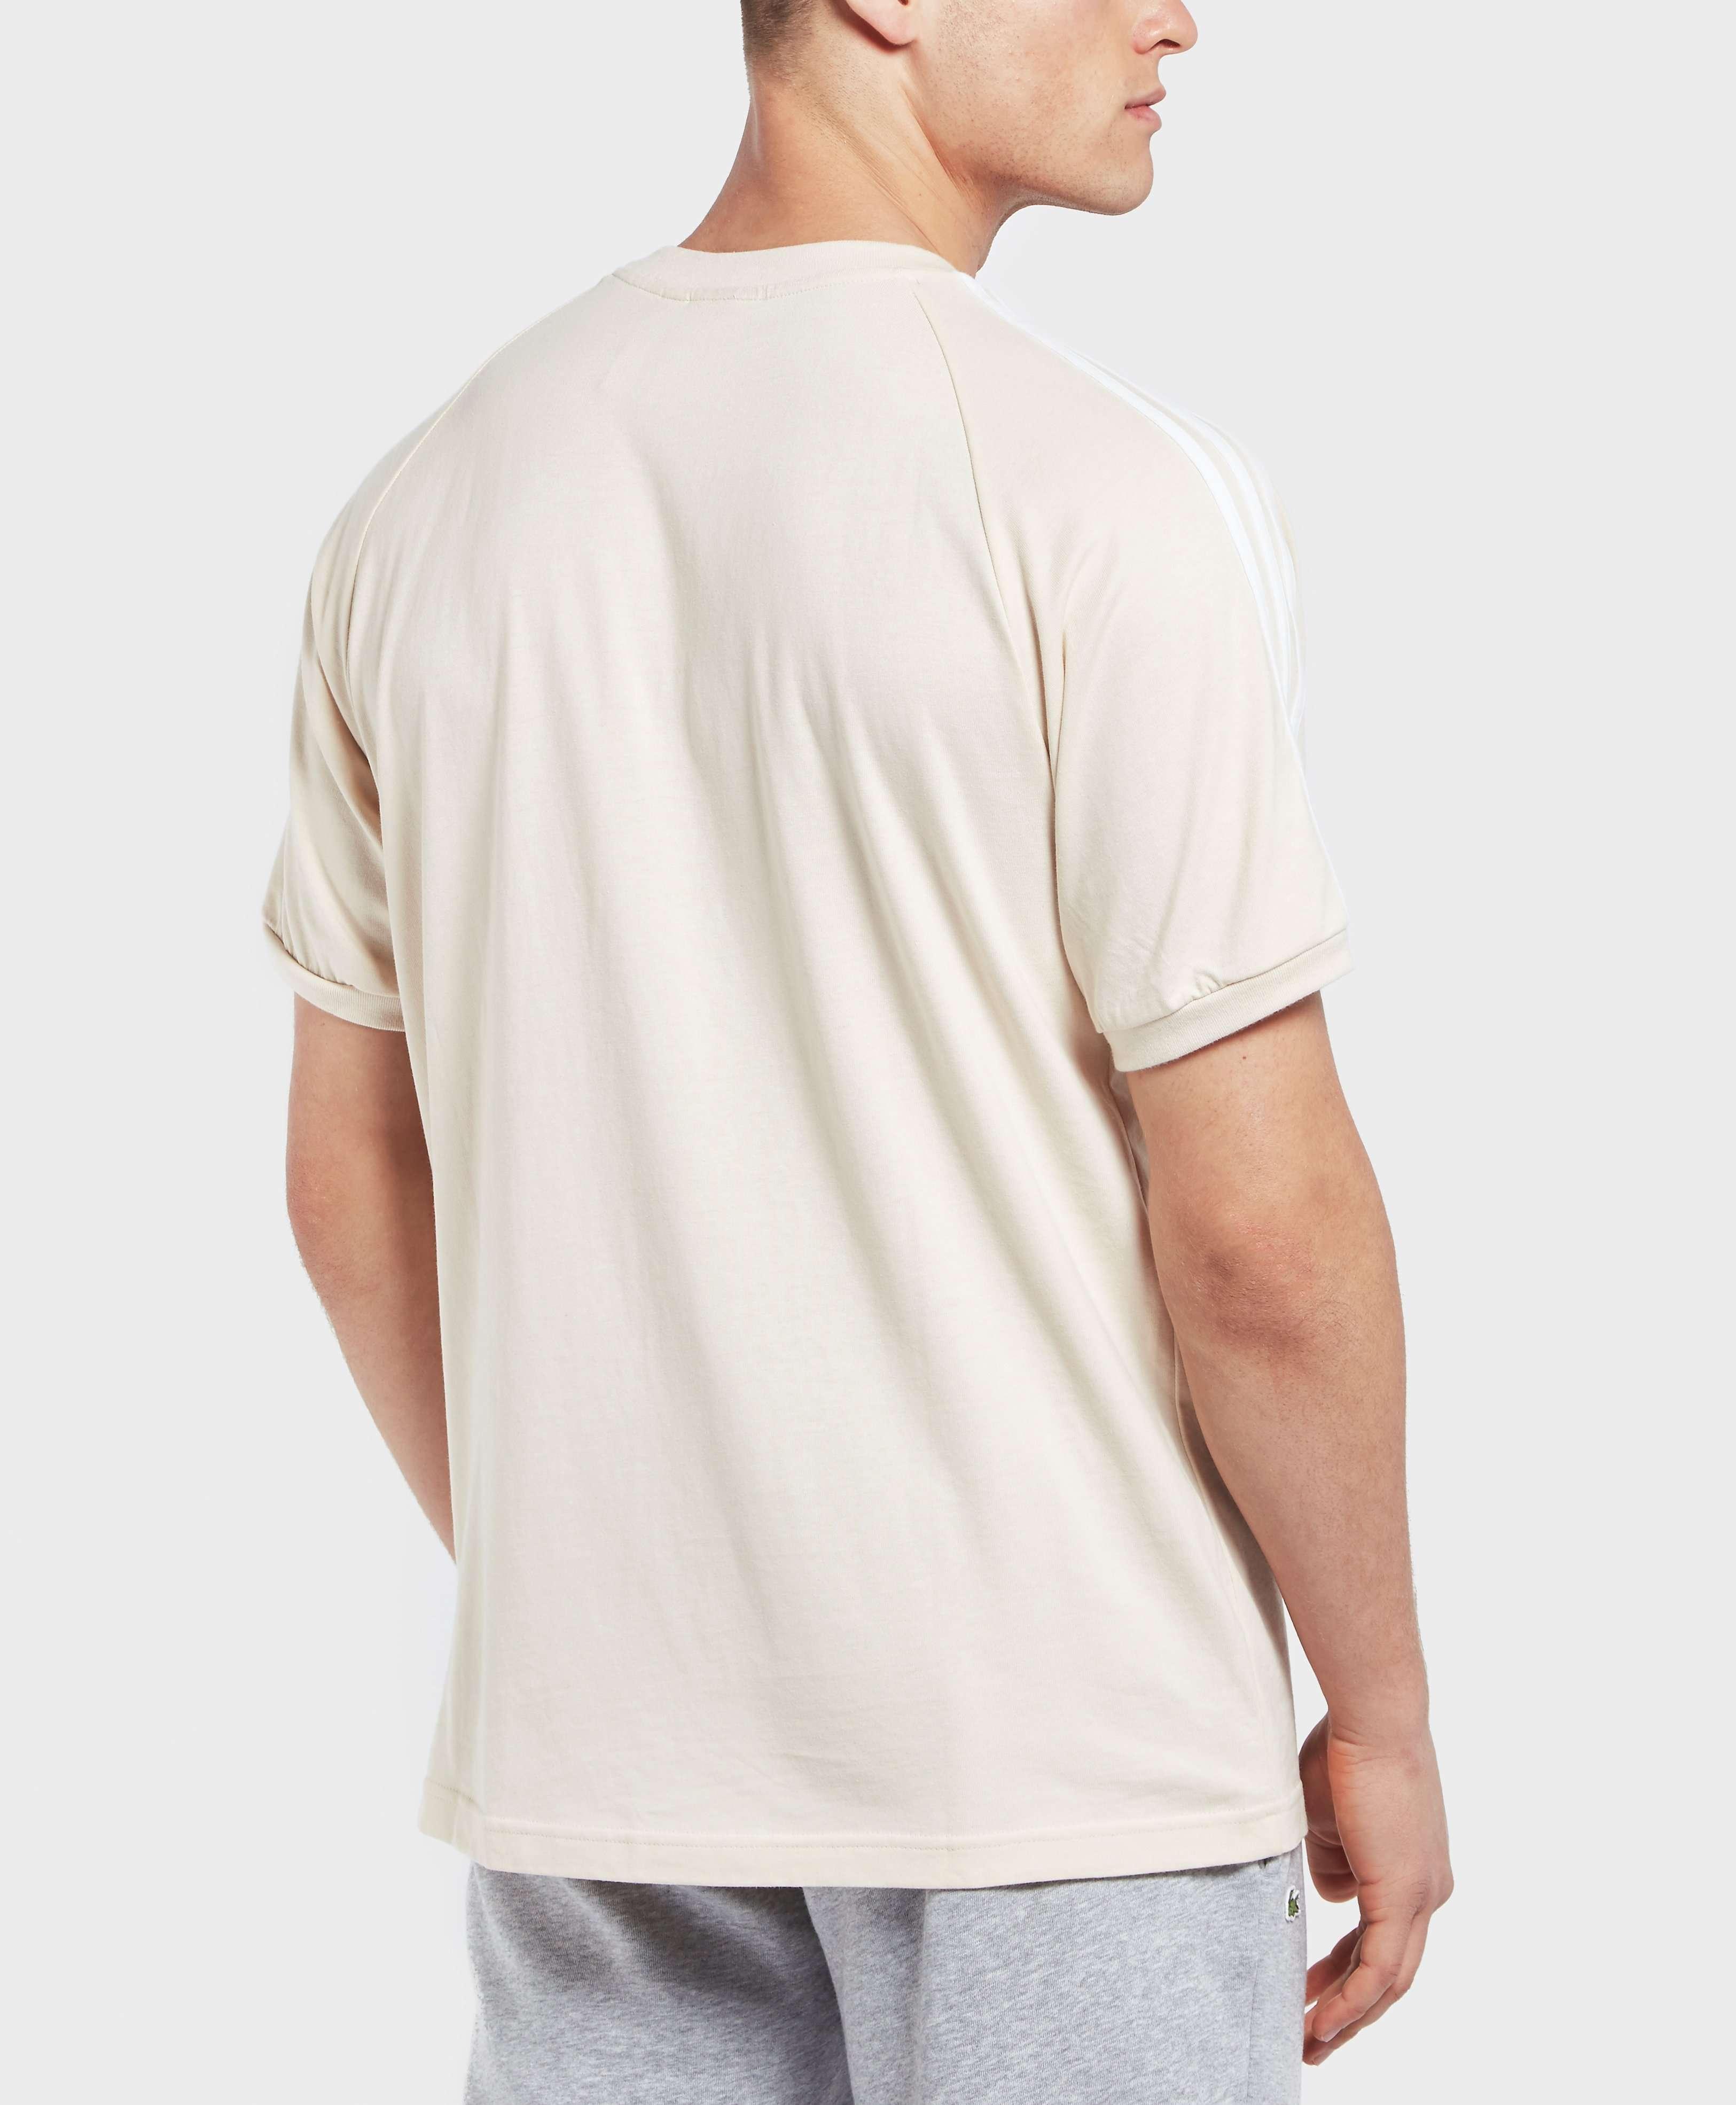 Adidas Originals camiseta de manga corta de 3 rayas California Scotts